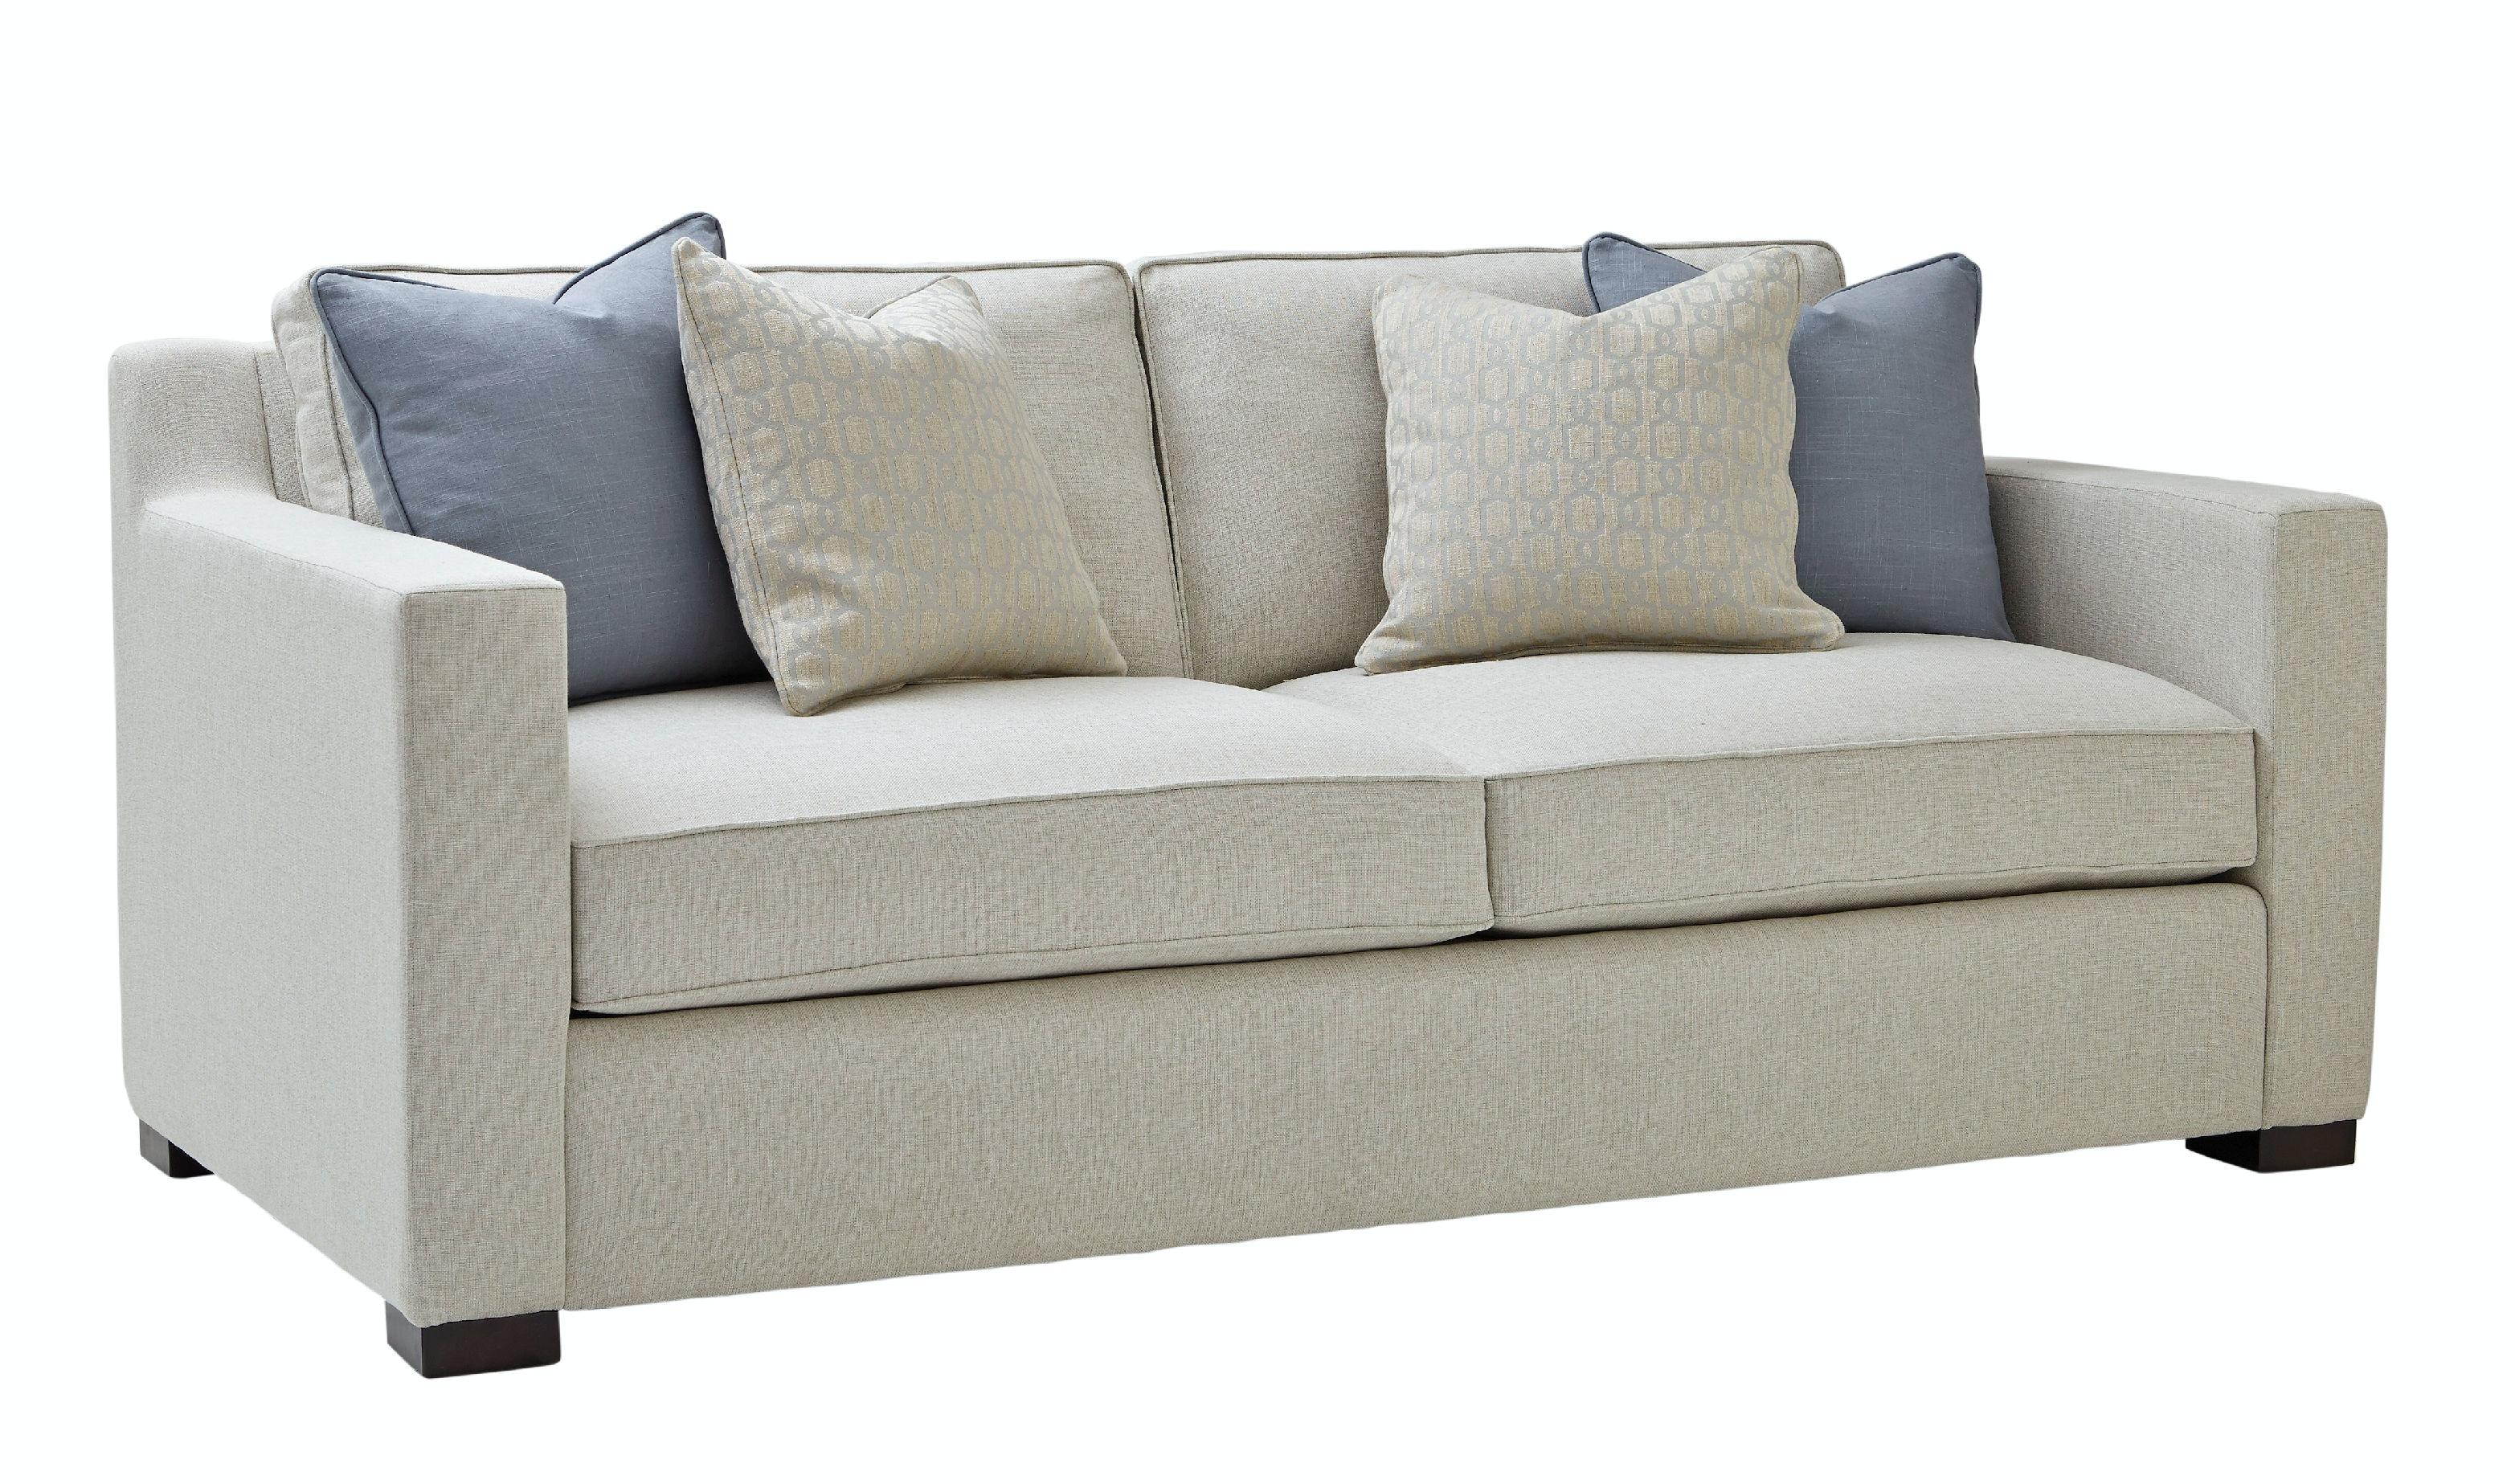 palmer sofa charleston fire audio braxton culler living room loft 5750 010 hennen at furniture